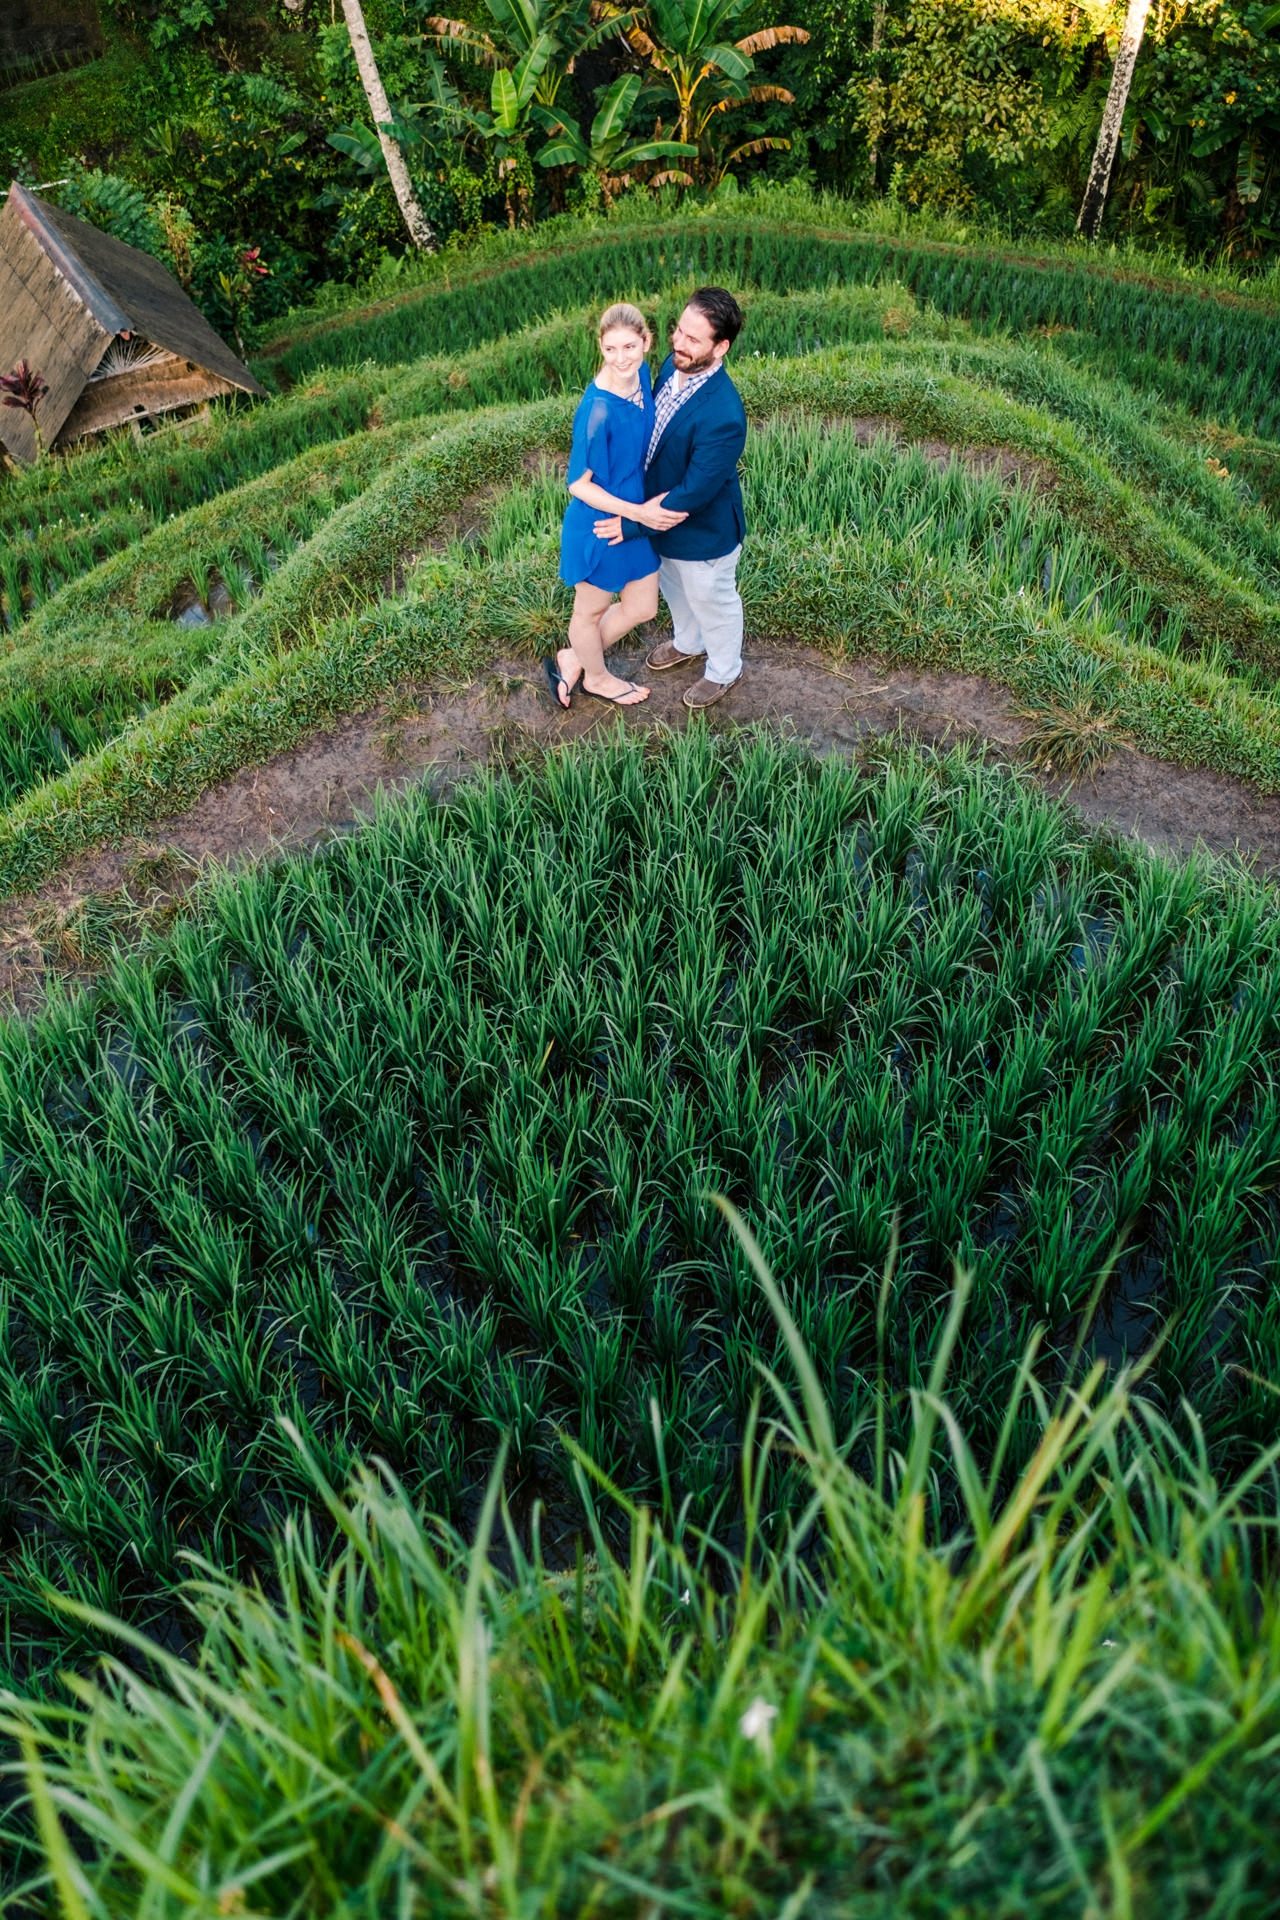 B&M: Surprise Proposal on Bali Vacation 6